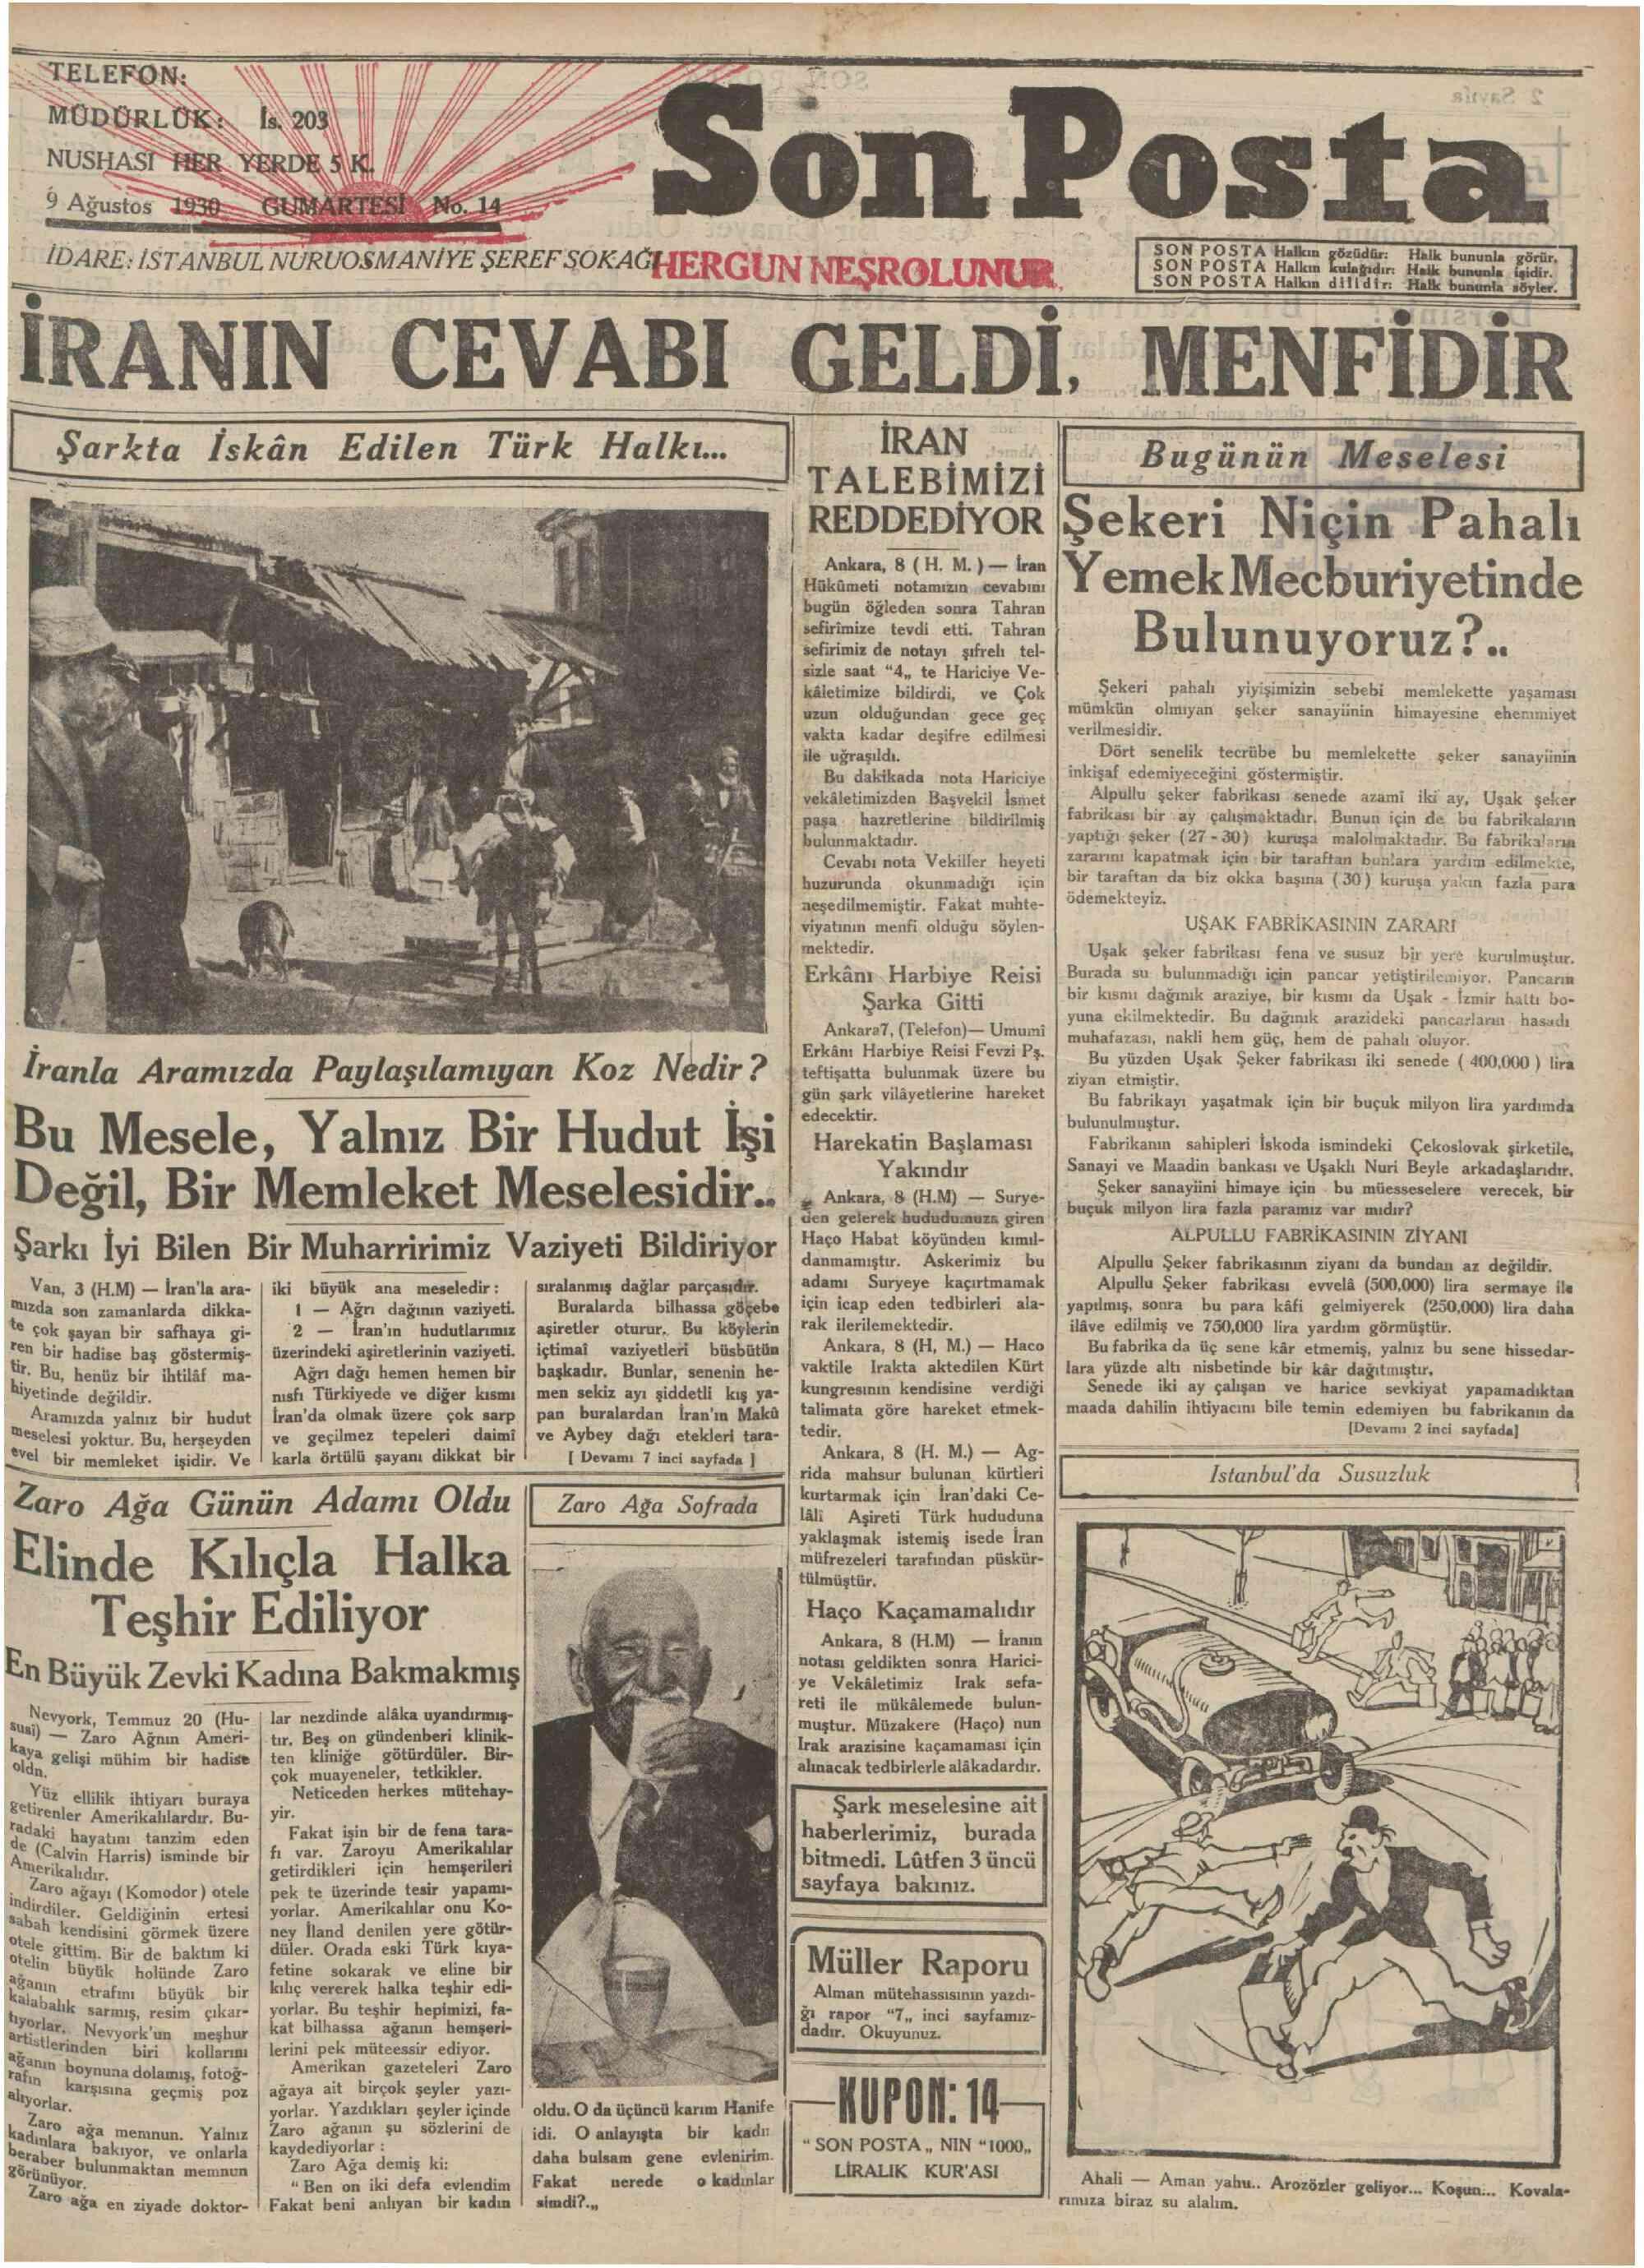 9 Ağustos 1930 Tarihli Son Posta Gazetesi Sayfa 1